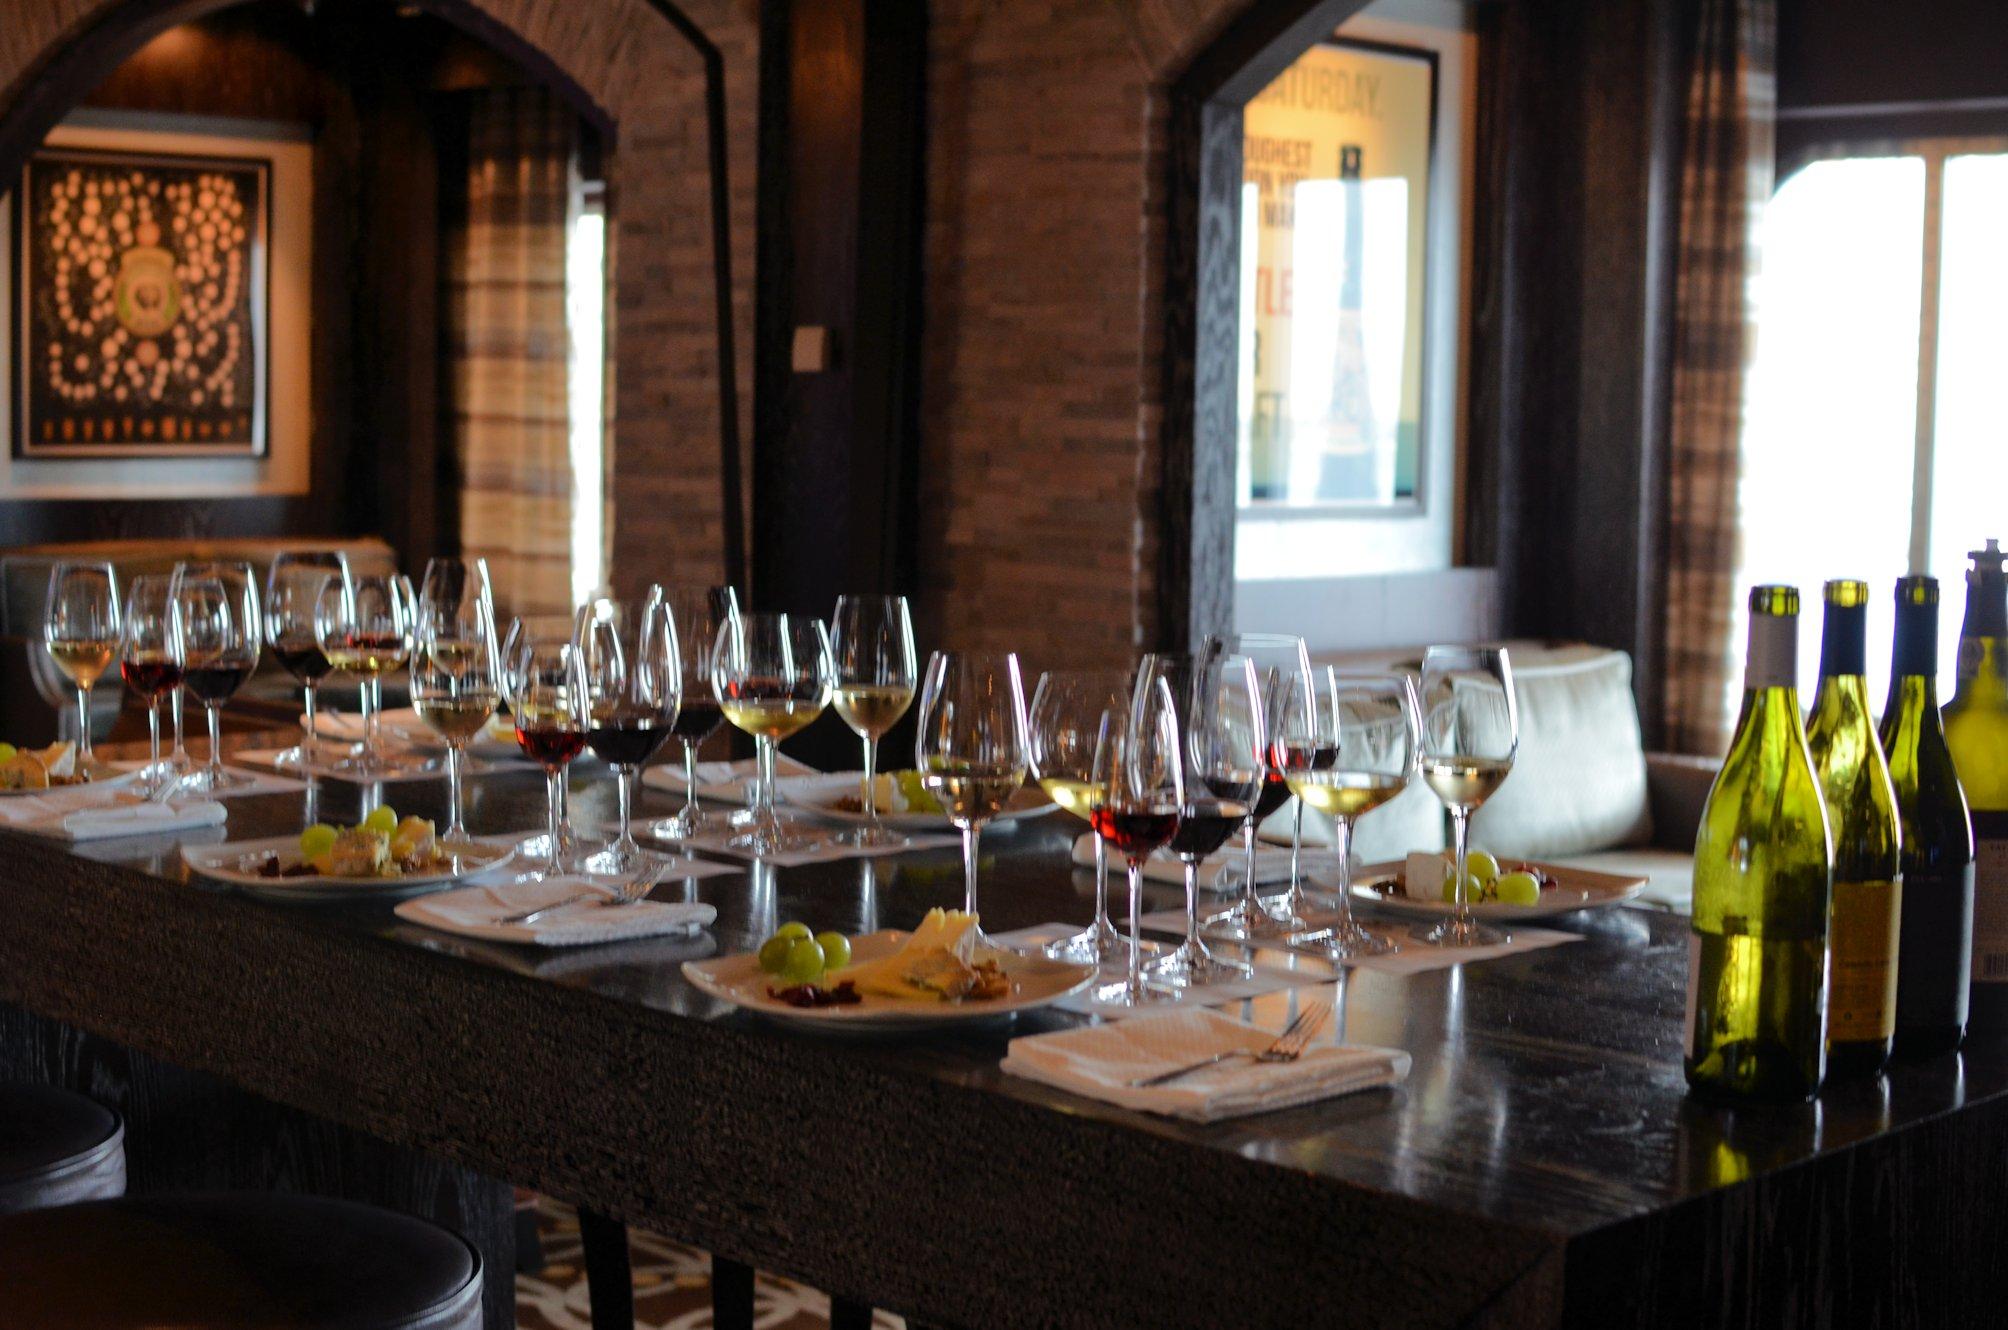 Travel Dine Amp Wine In Style On Celebrity Equinox Around